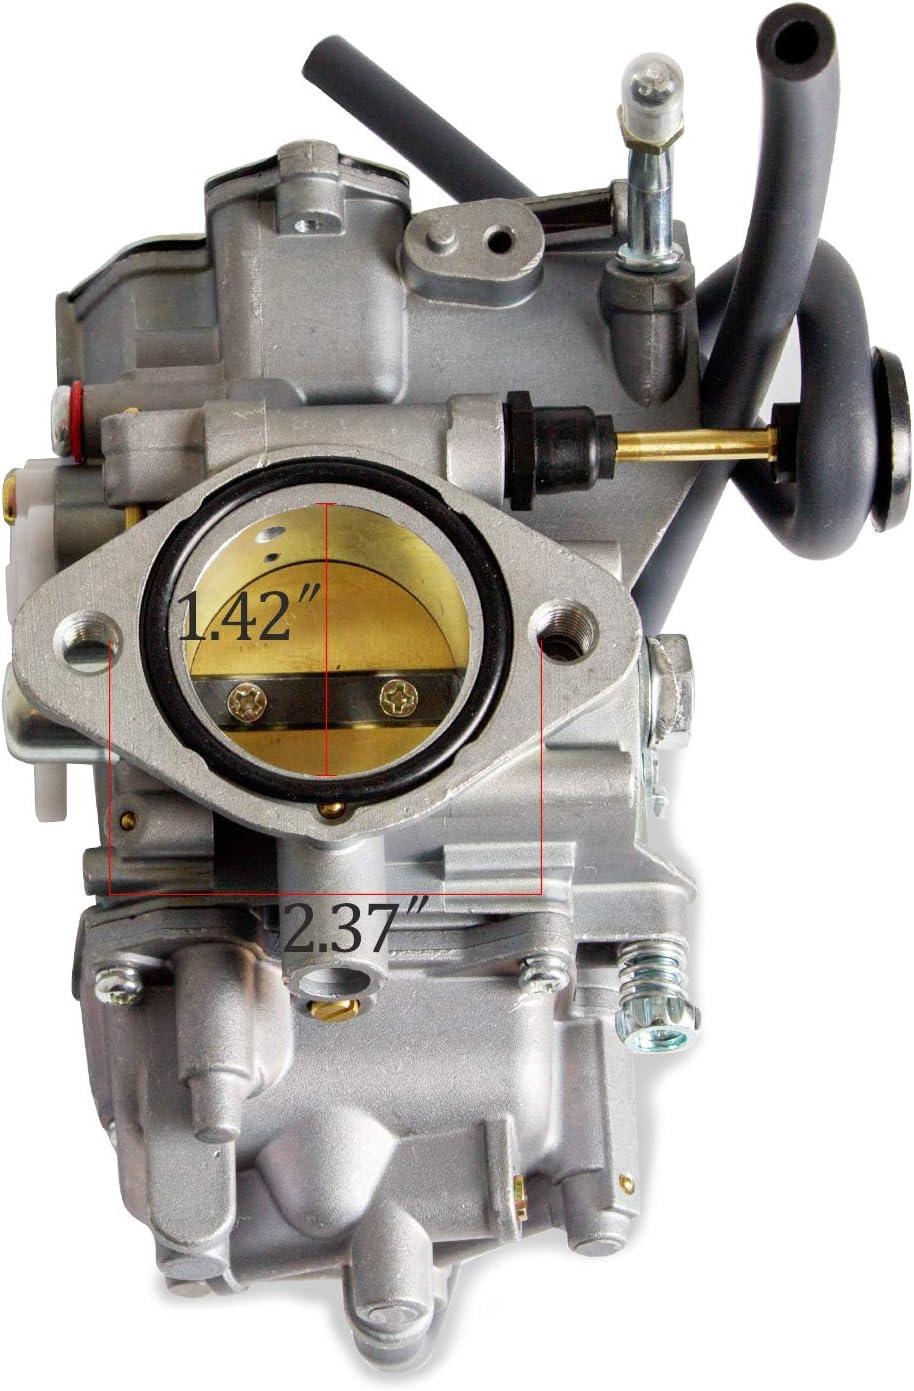 1996-1998 Kodiak 400 YFM400 Complete Carburetor With Intake Manifold For YAMAHA1987-1990/&1992-1995 Moto-4 350 YFM350 1987-2004 Warrior 350 1995 Wolverine 350 YFM35F 1987-1998 Big Bear 350